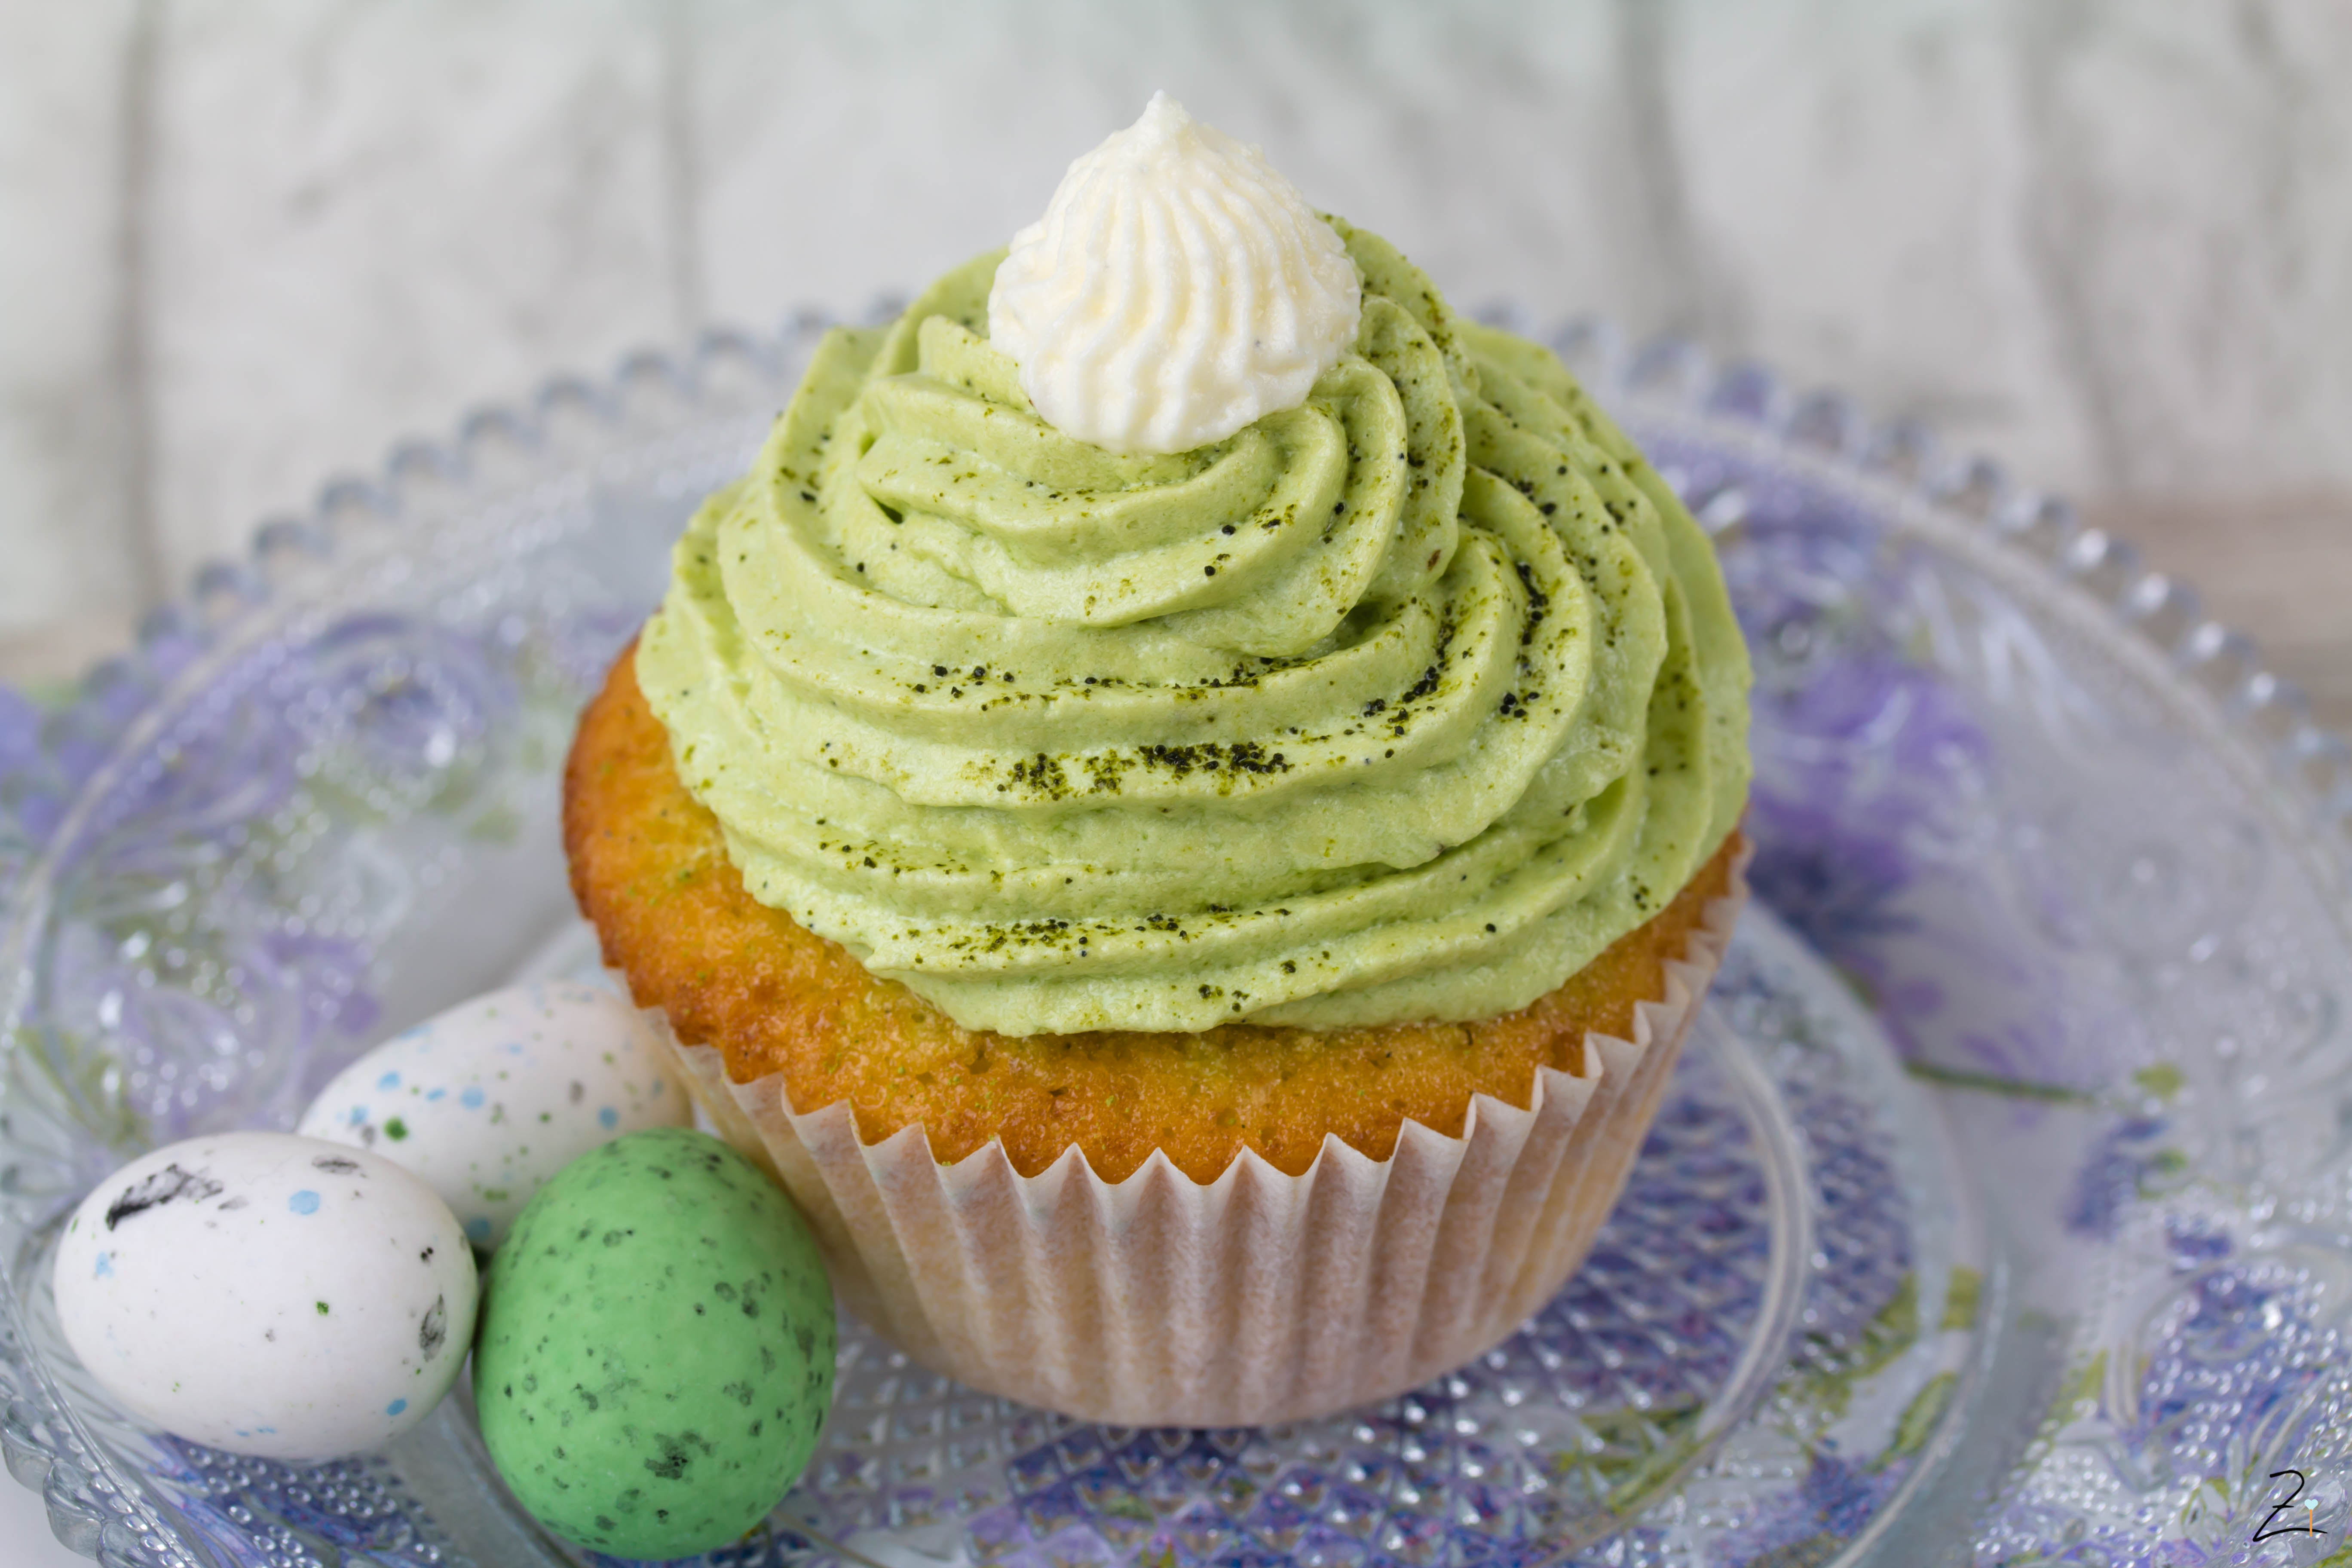 Zimtblume.de - Vanille Cupcakes mit Matcha Topping